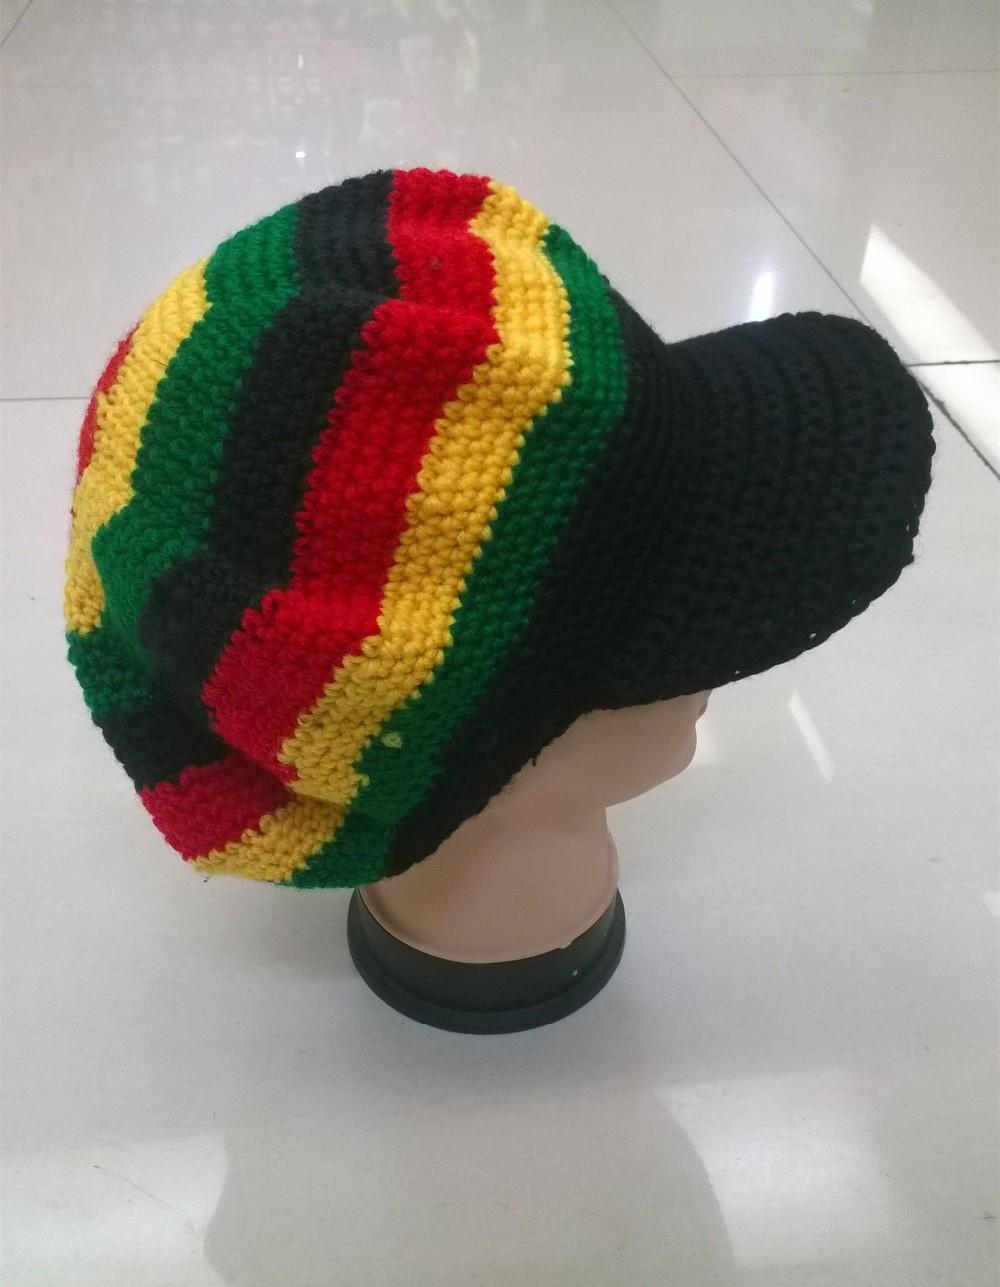 46a86030eca14 2019 Bob Marley Jamaica Rasta Beanie Hat Warm Cap Winter Reggae ...